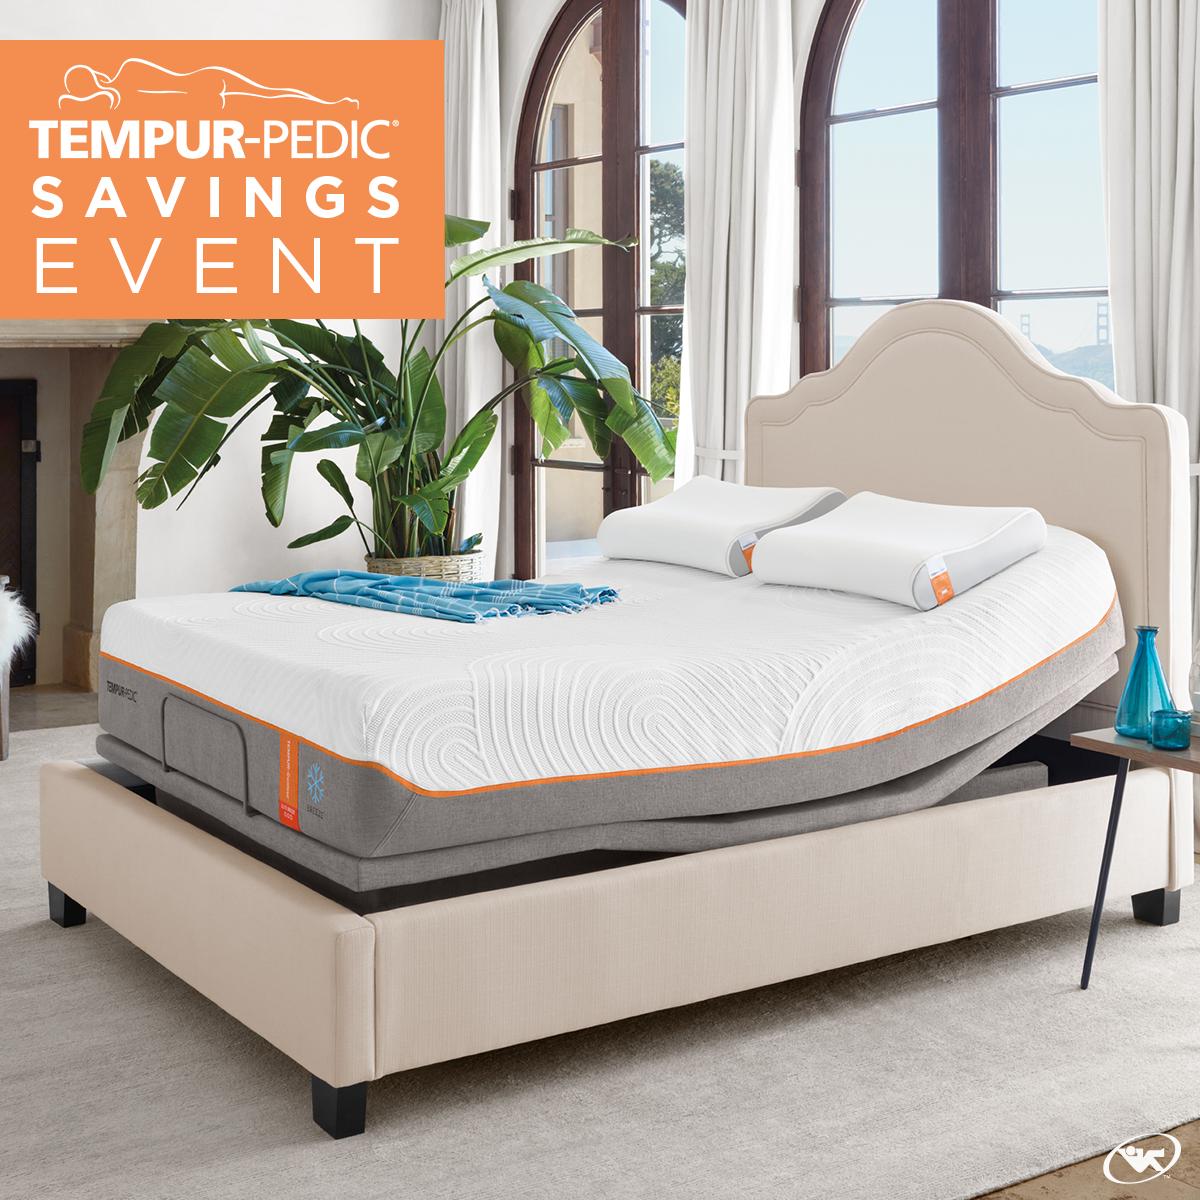 Save Big Sleep Easy Save Up To 500 On Select Tempur Pedic Adjustable Mattress Sets Ask Our Associates Ab Mattress Sets Tempurpedic Tempurpedic Mattress